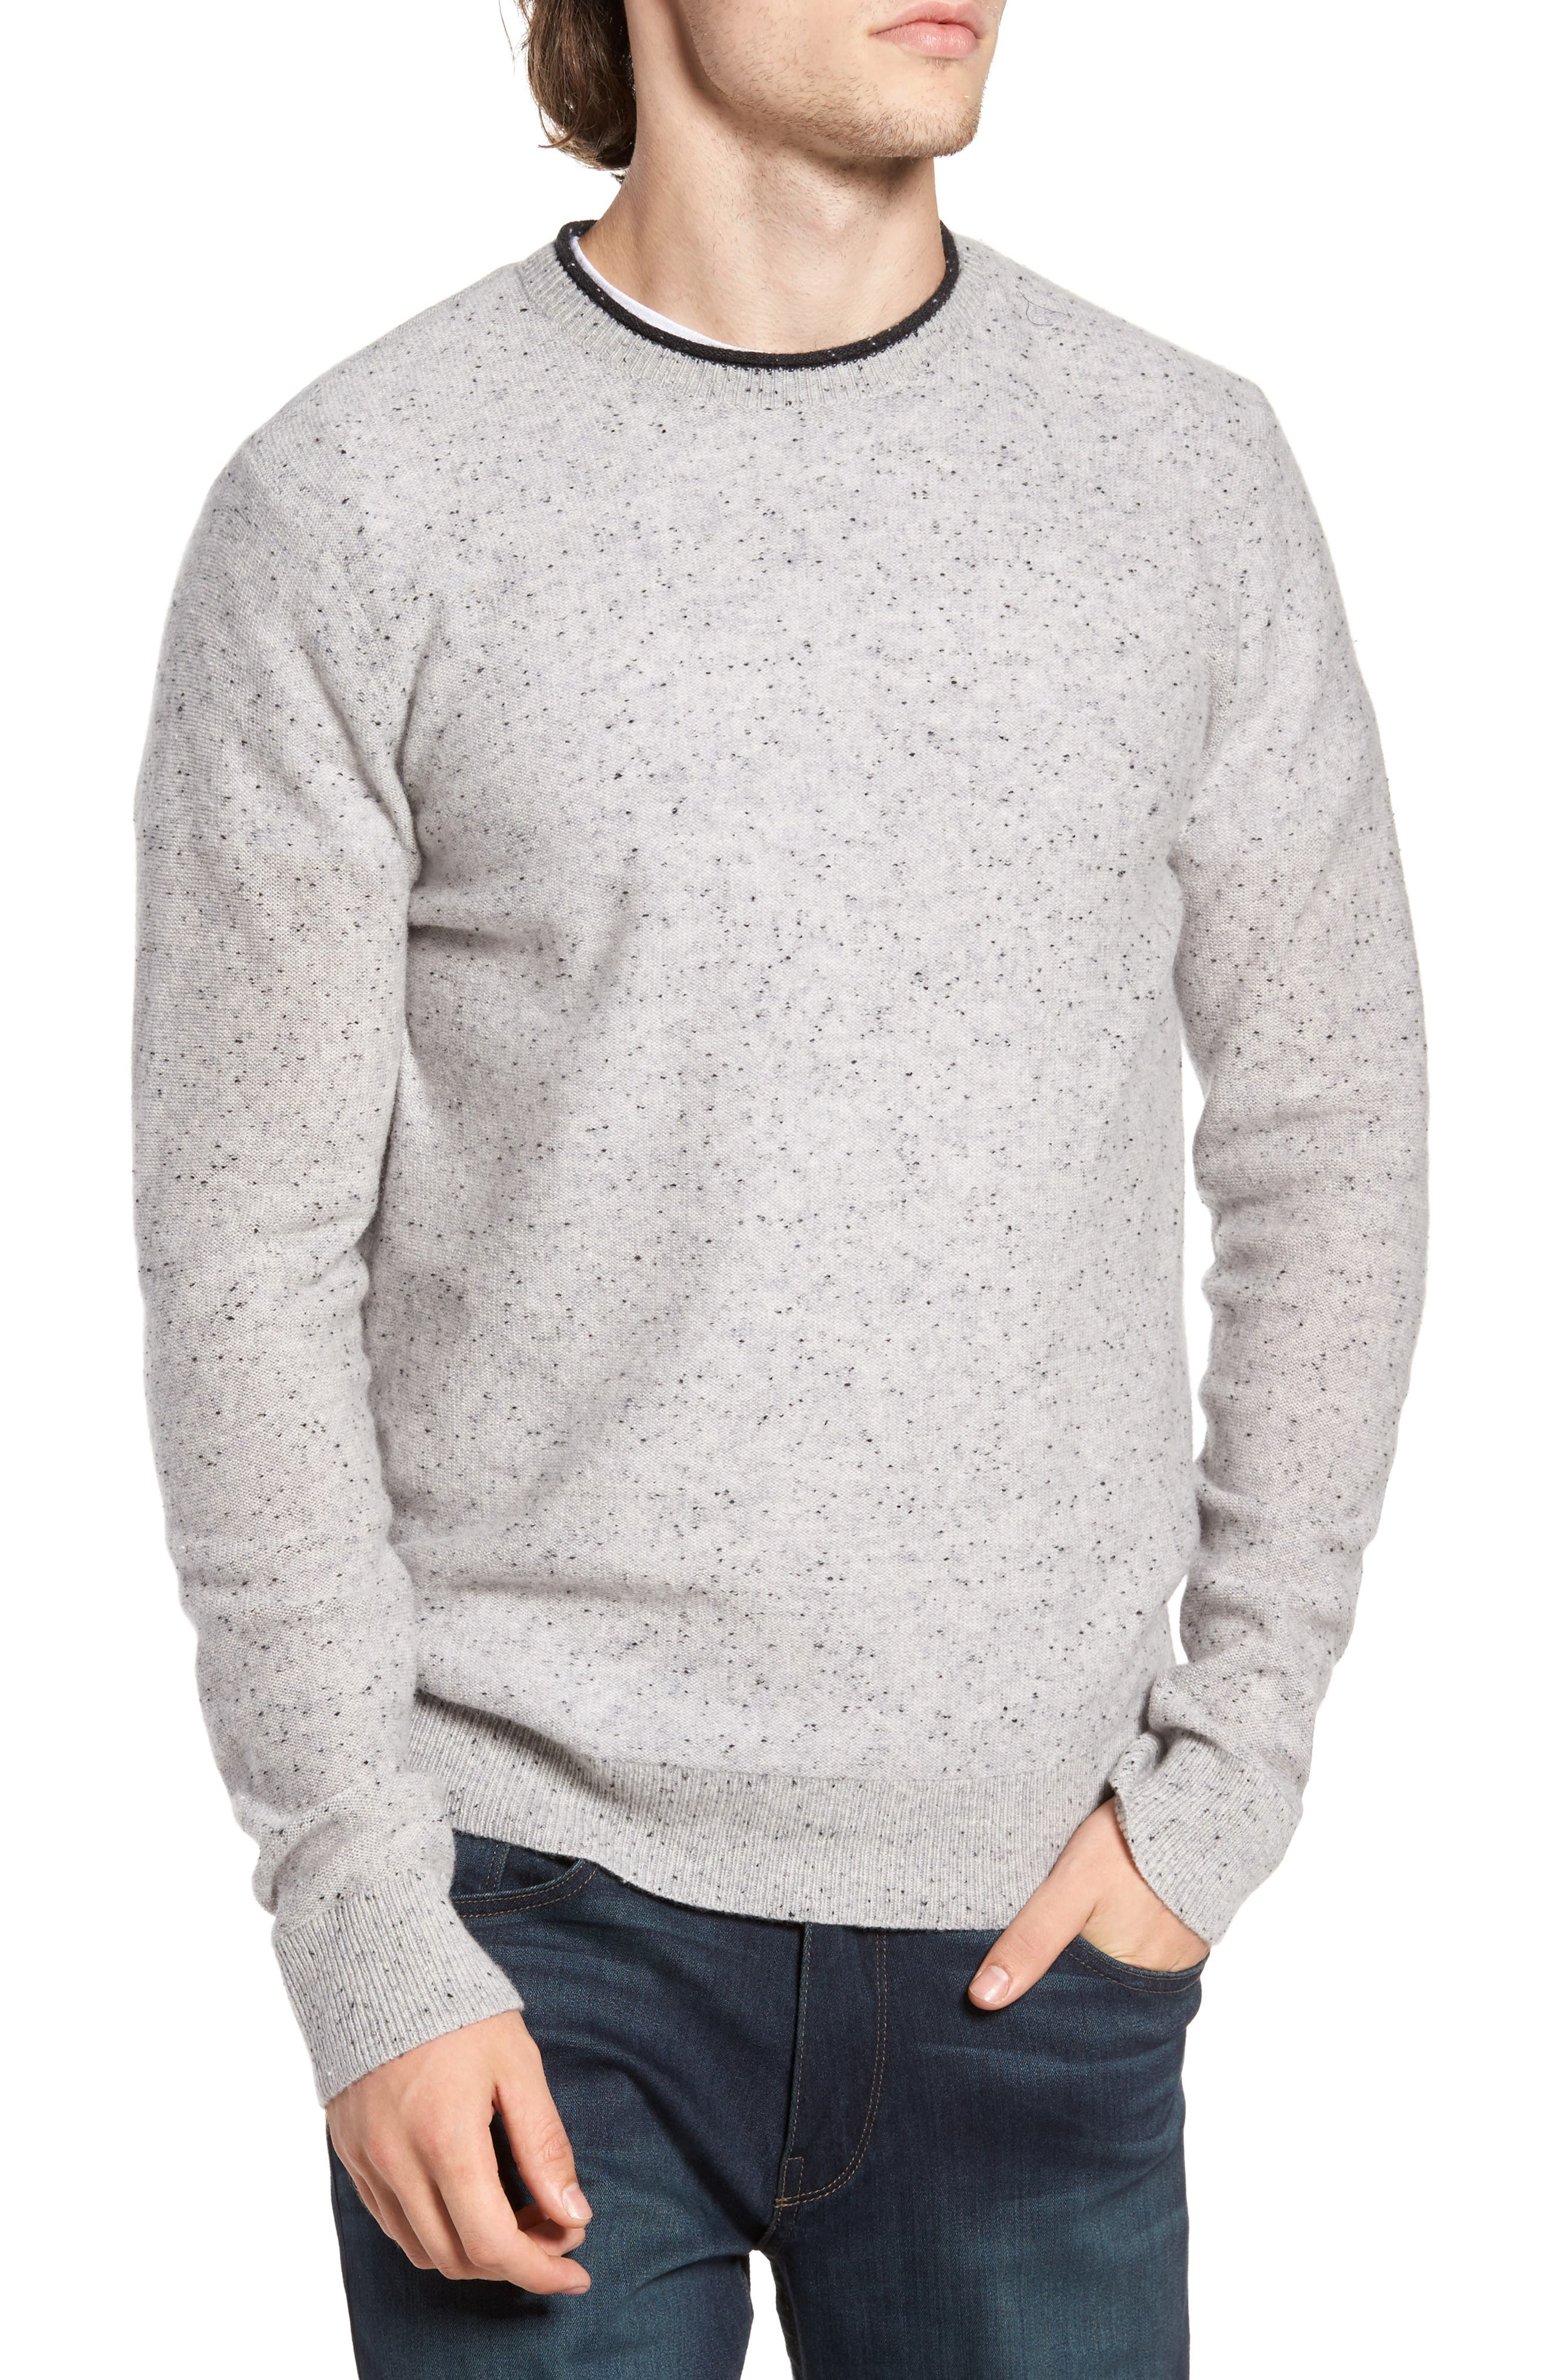 1901 Nep Wool & Cashmere Sweater